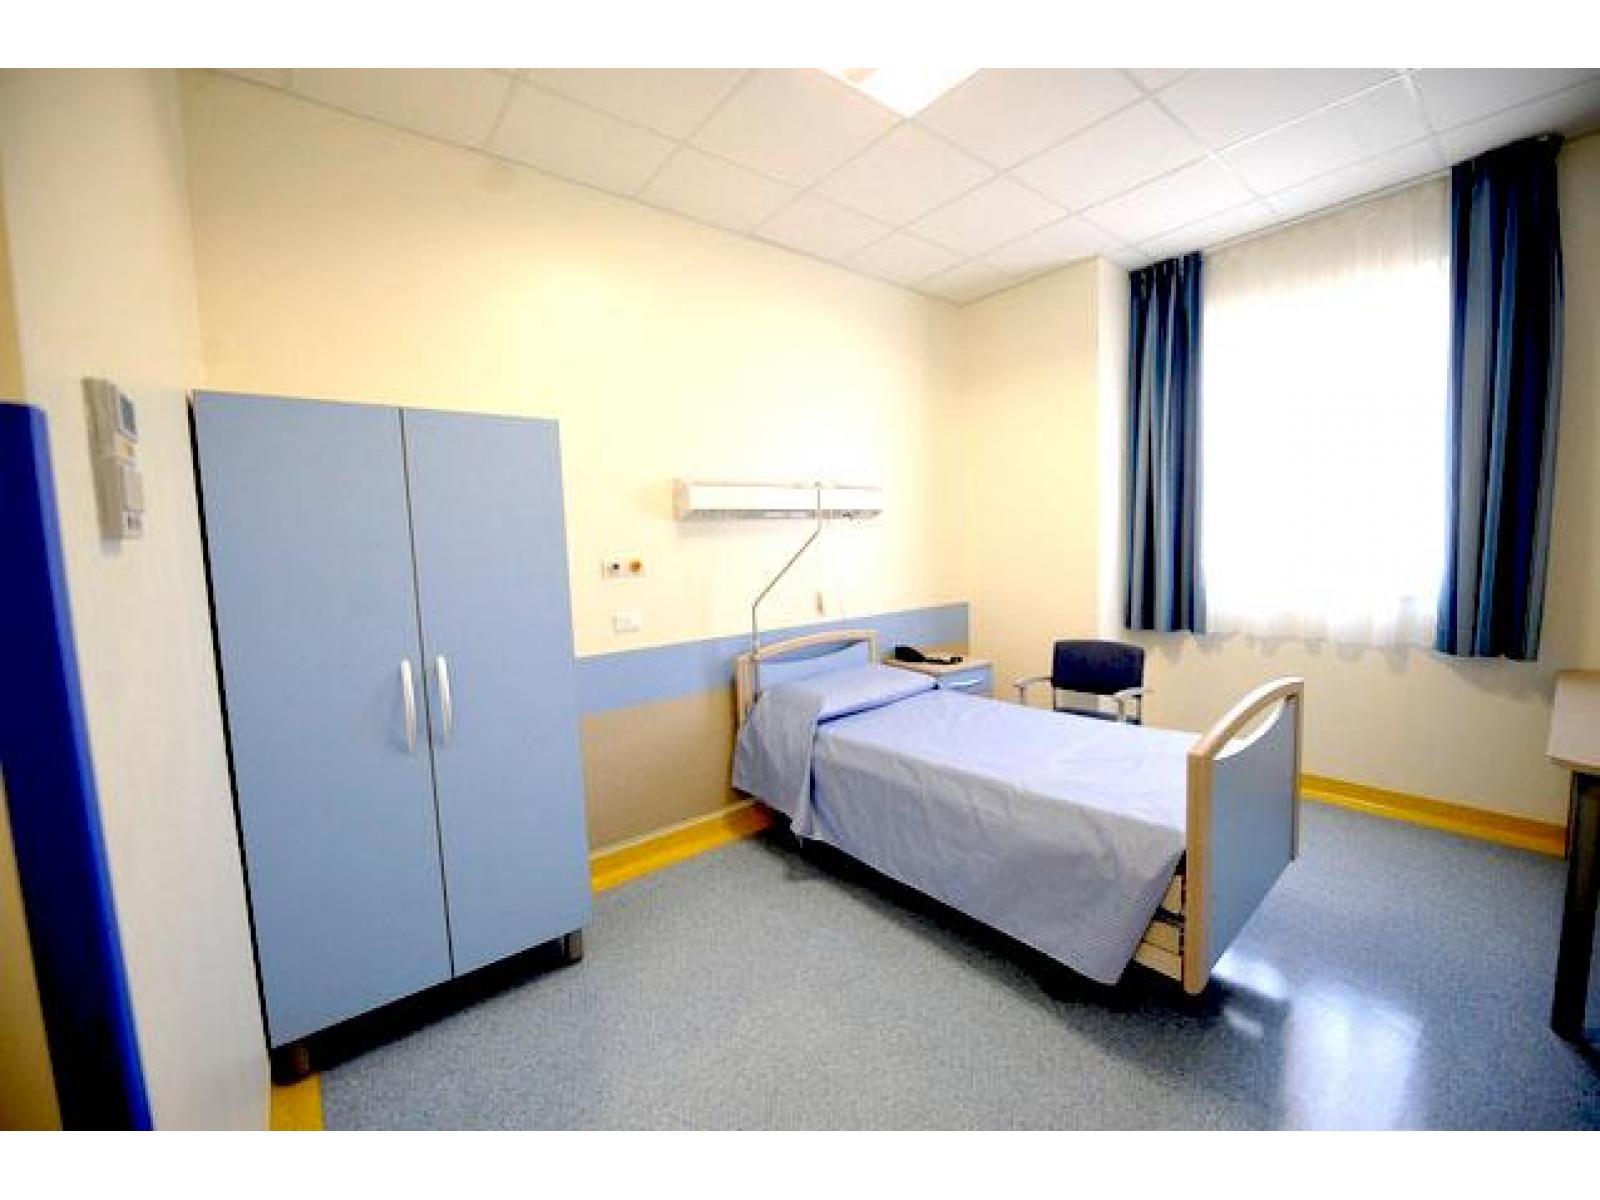 Spitalul Monza - 480677_425258424216094_458188878_n.jpg